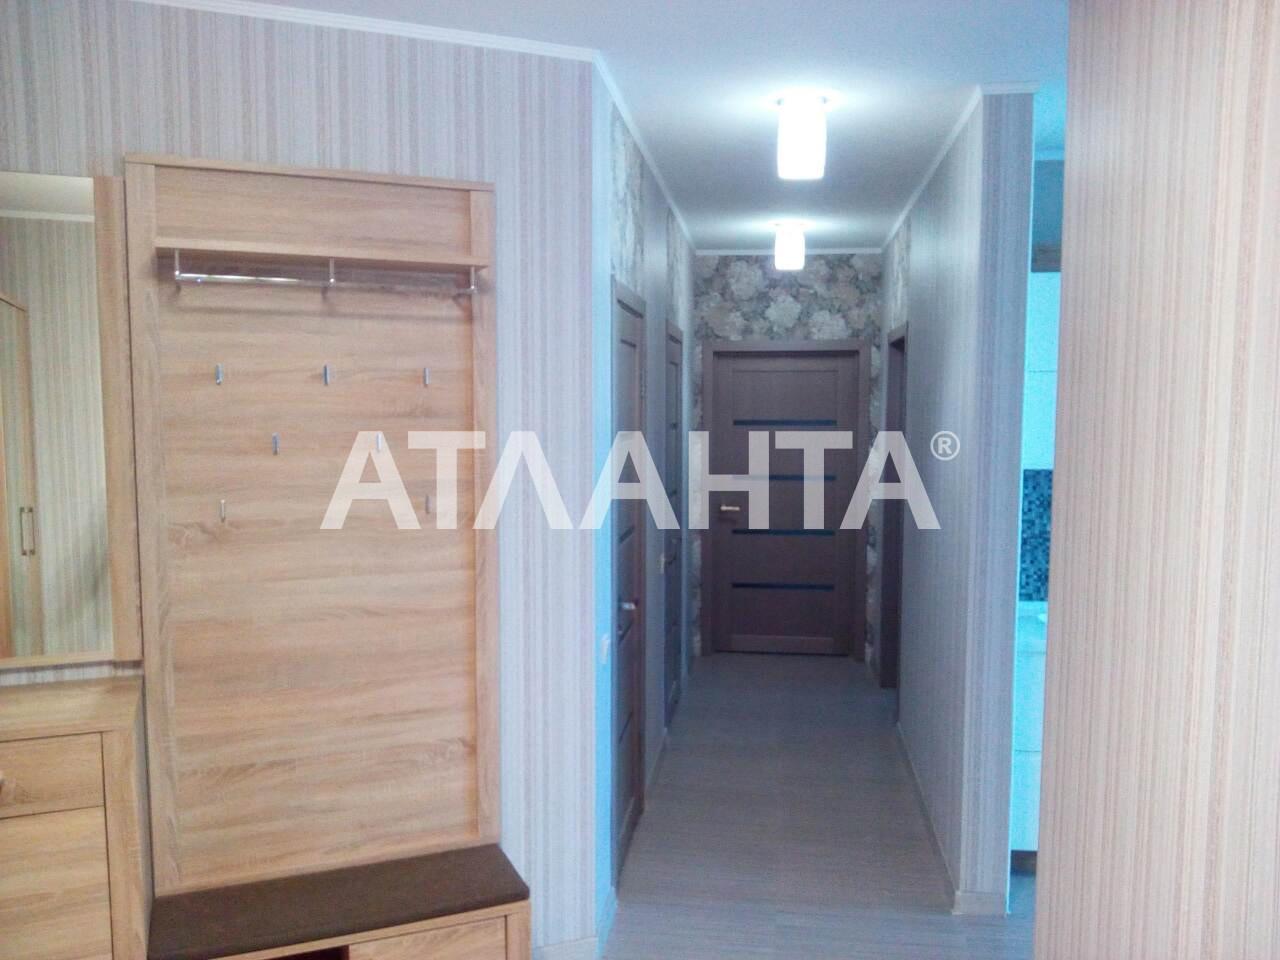 Продается 3-комнатная Квартира на ул. Просп. Глушкова — 139 000 у.е. (фото №5)